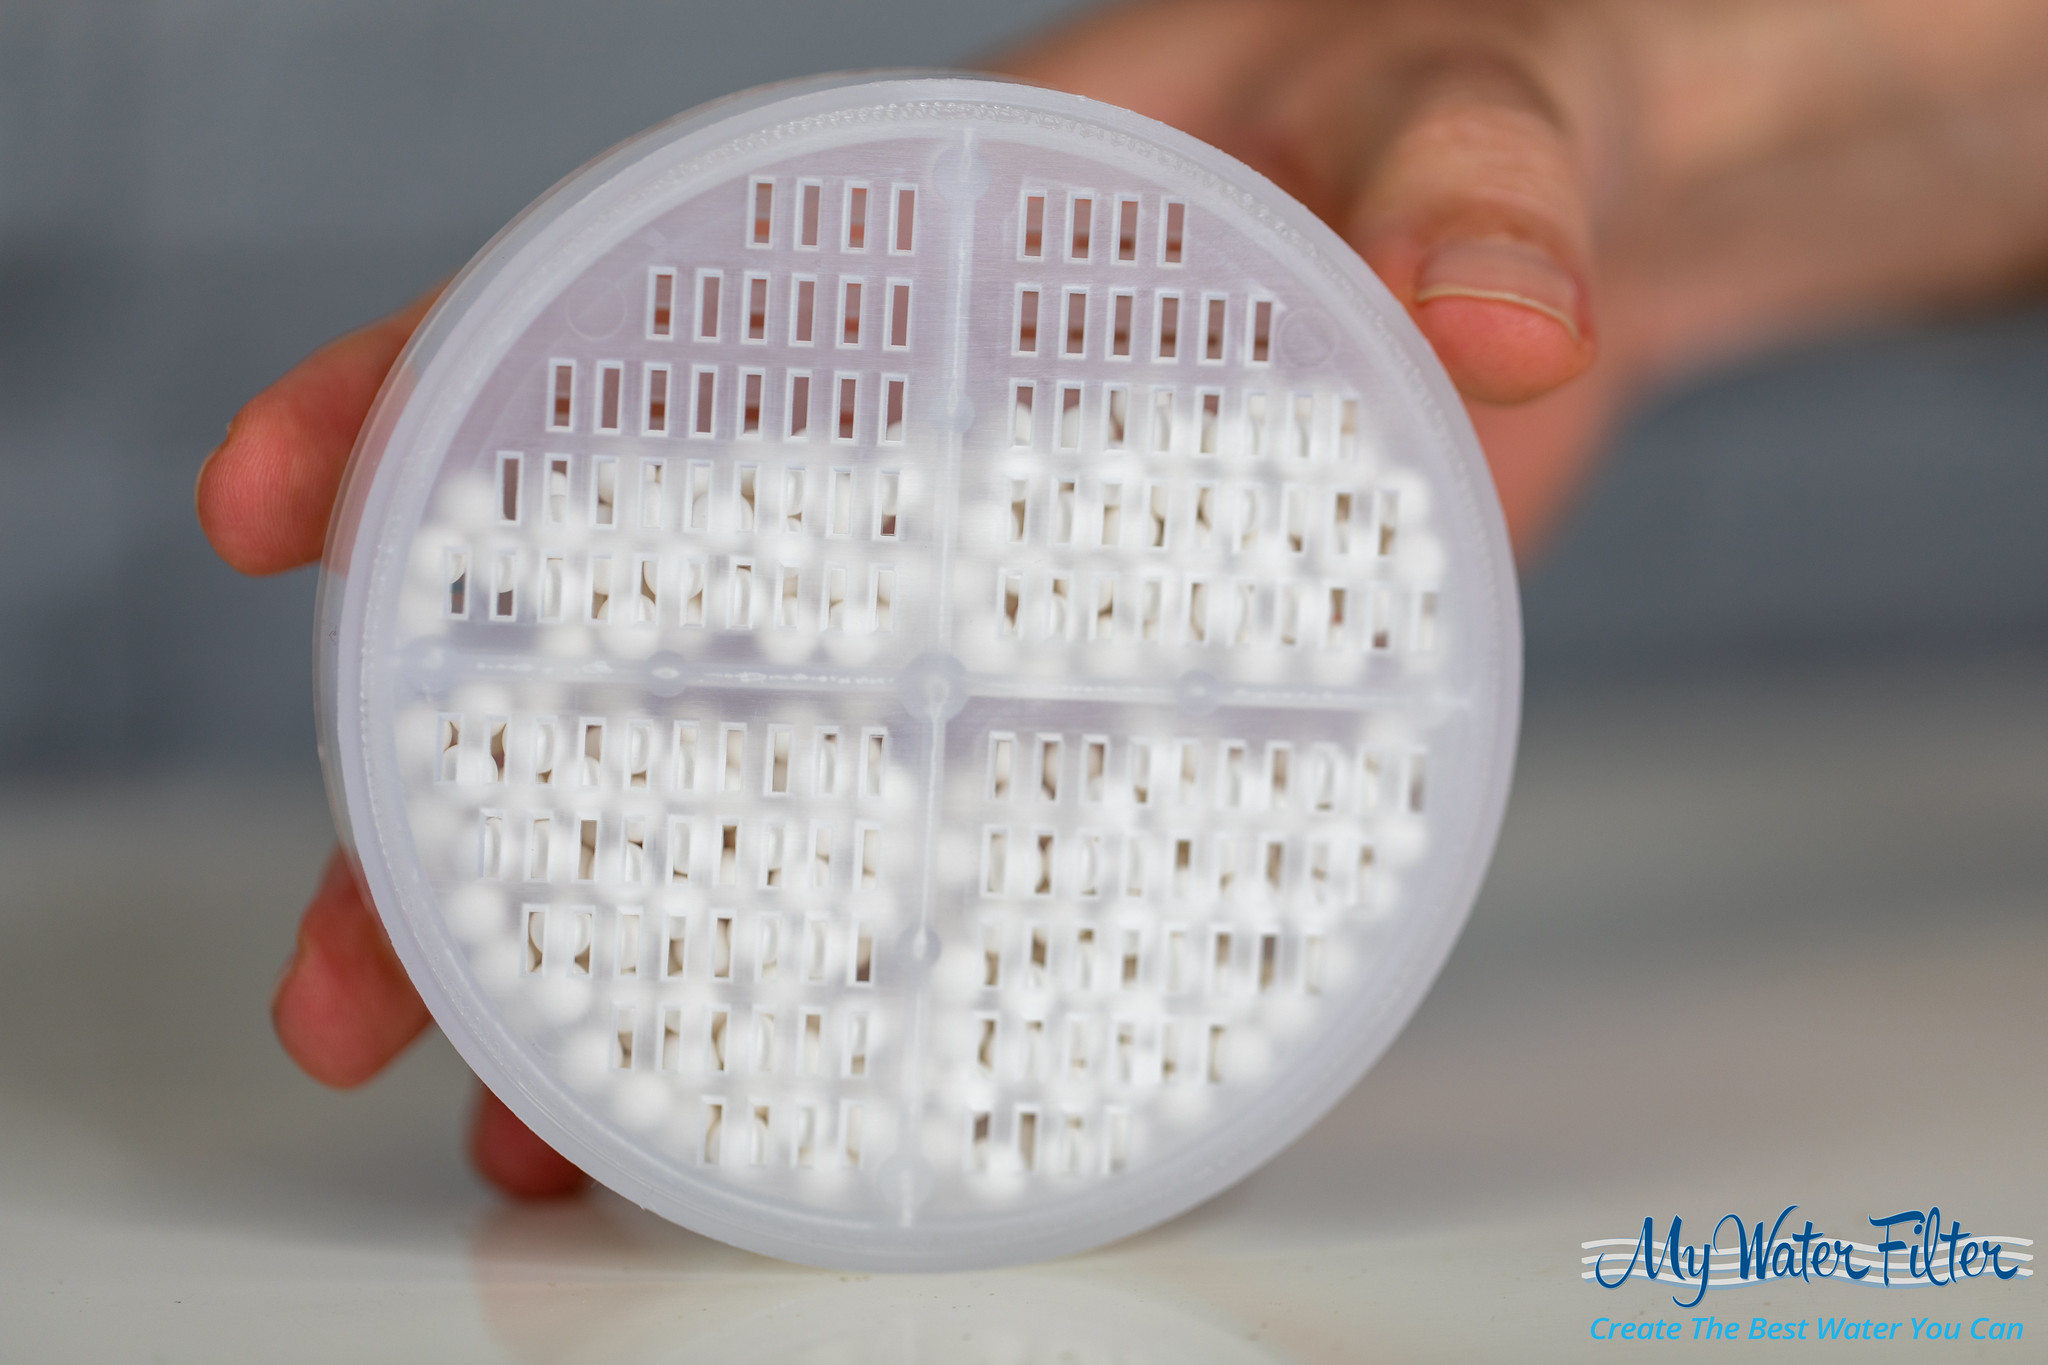 Aroma Sense Q Vitamin C Shower Filter shower head antibacterial ceramic balls